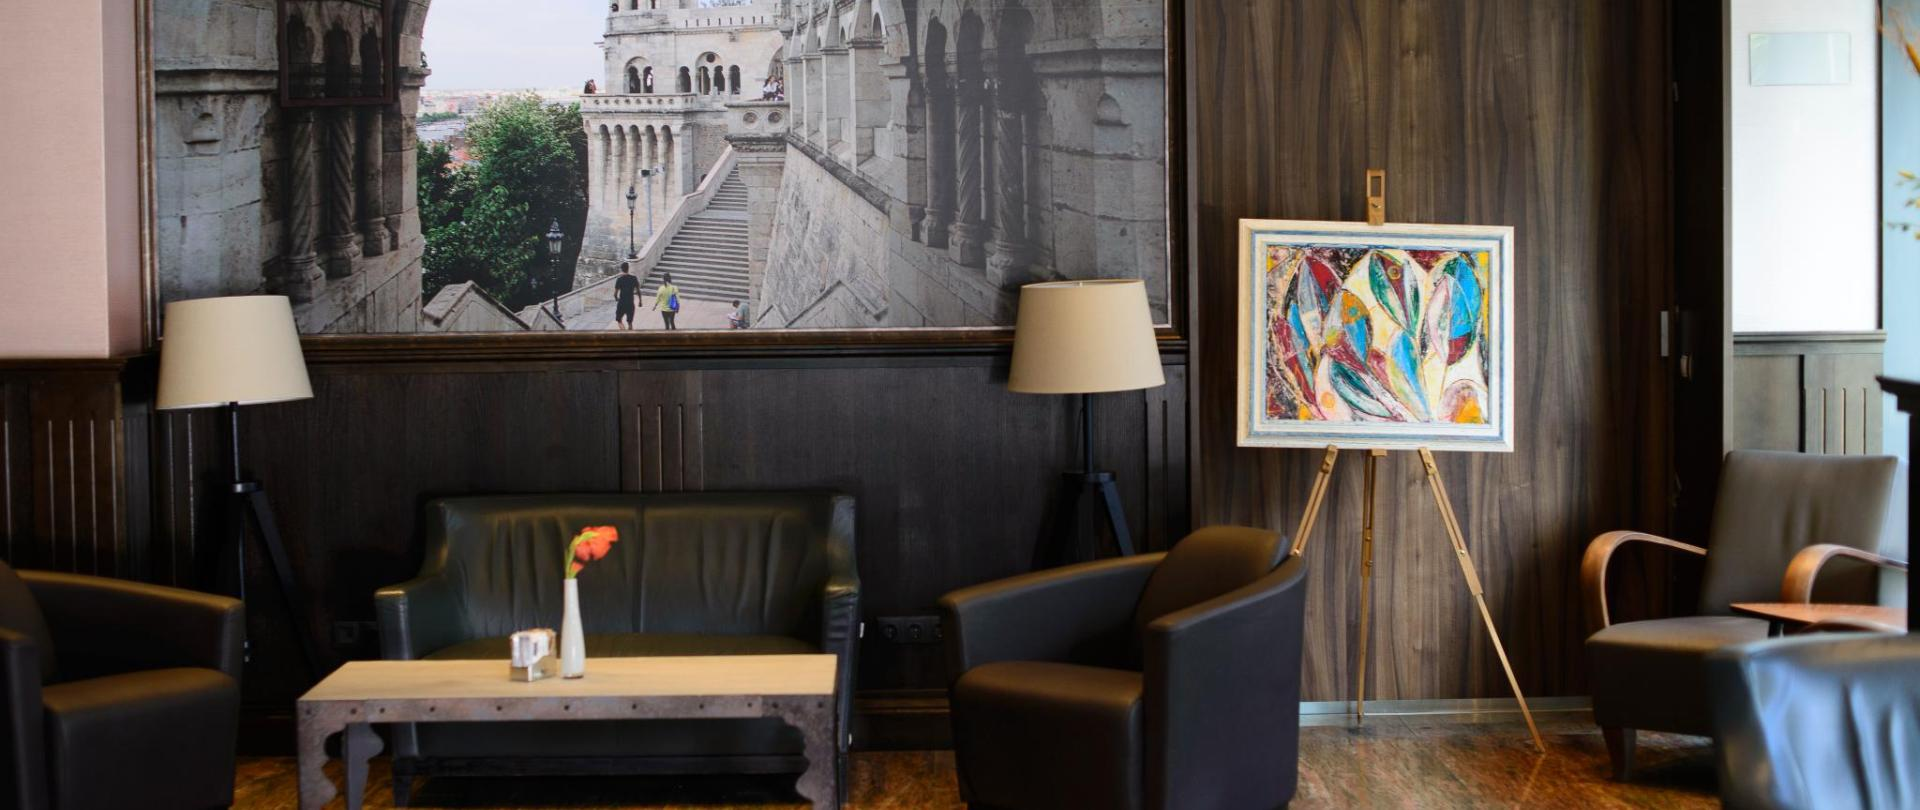 Hotel BUdapest - Lobby.jpg